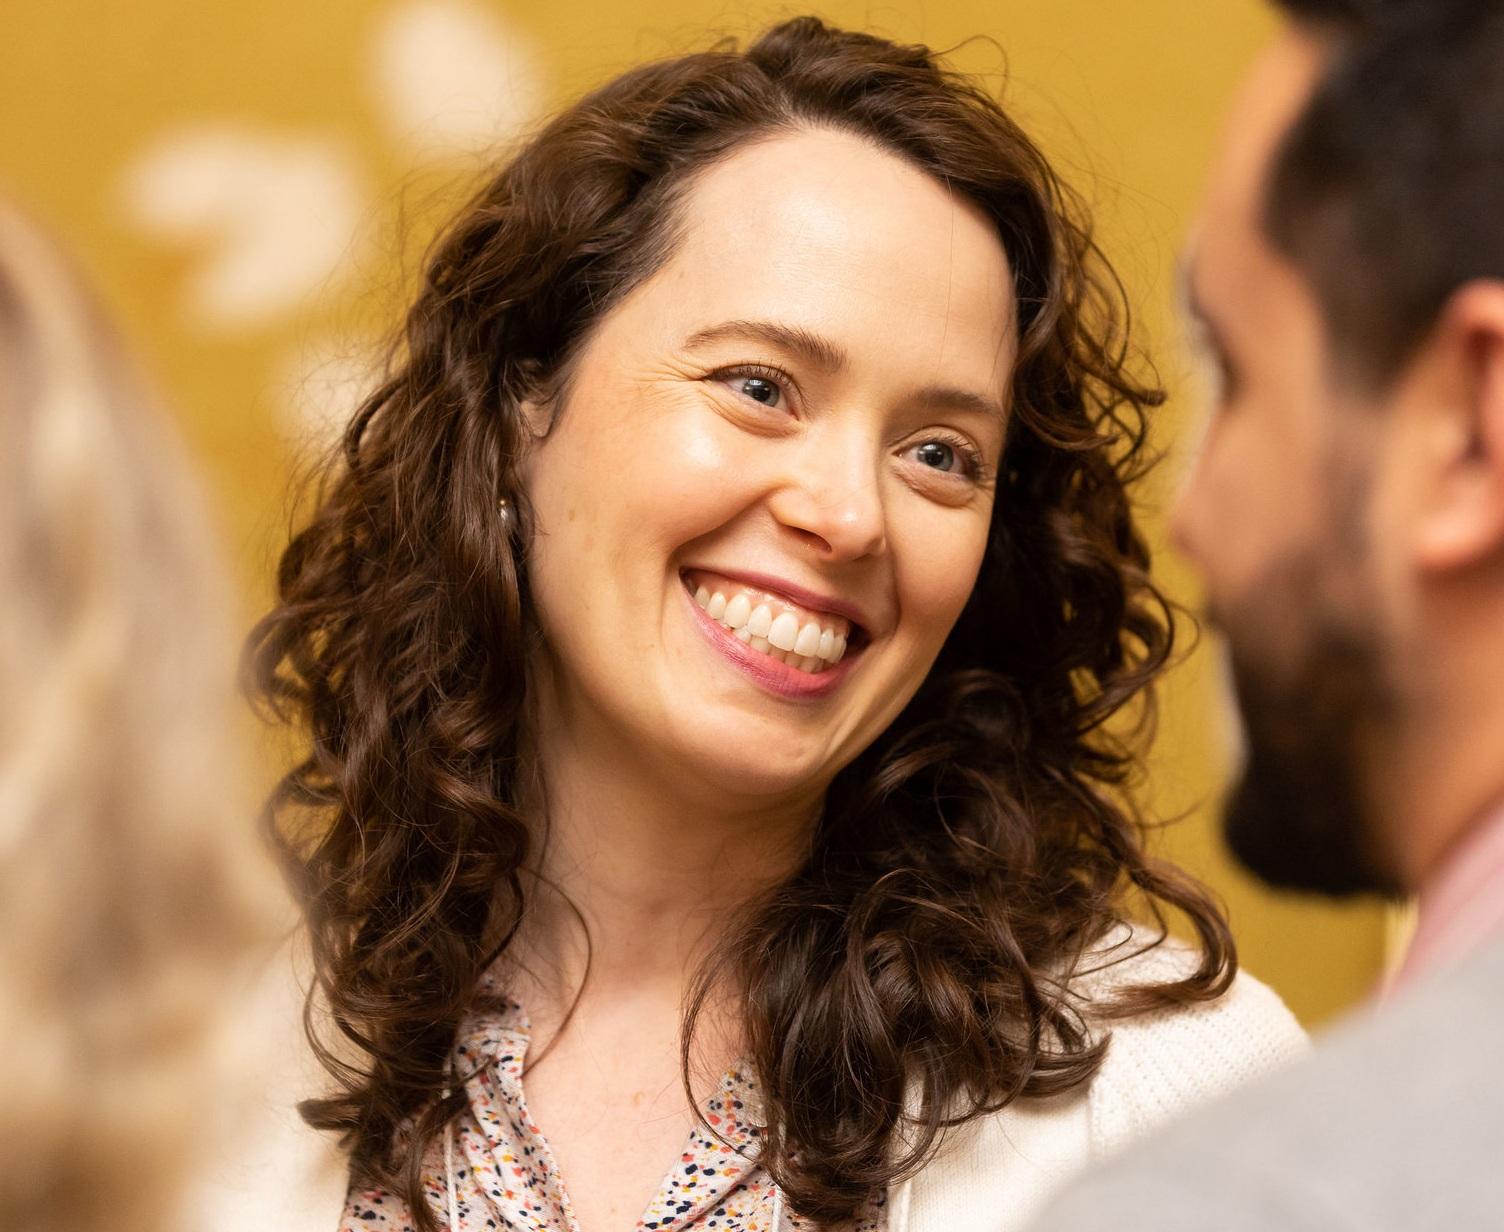 Dr. Sarah Schlatterer, MD, PhD - Current FellowPrior Training in Child Neurology